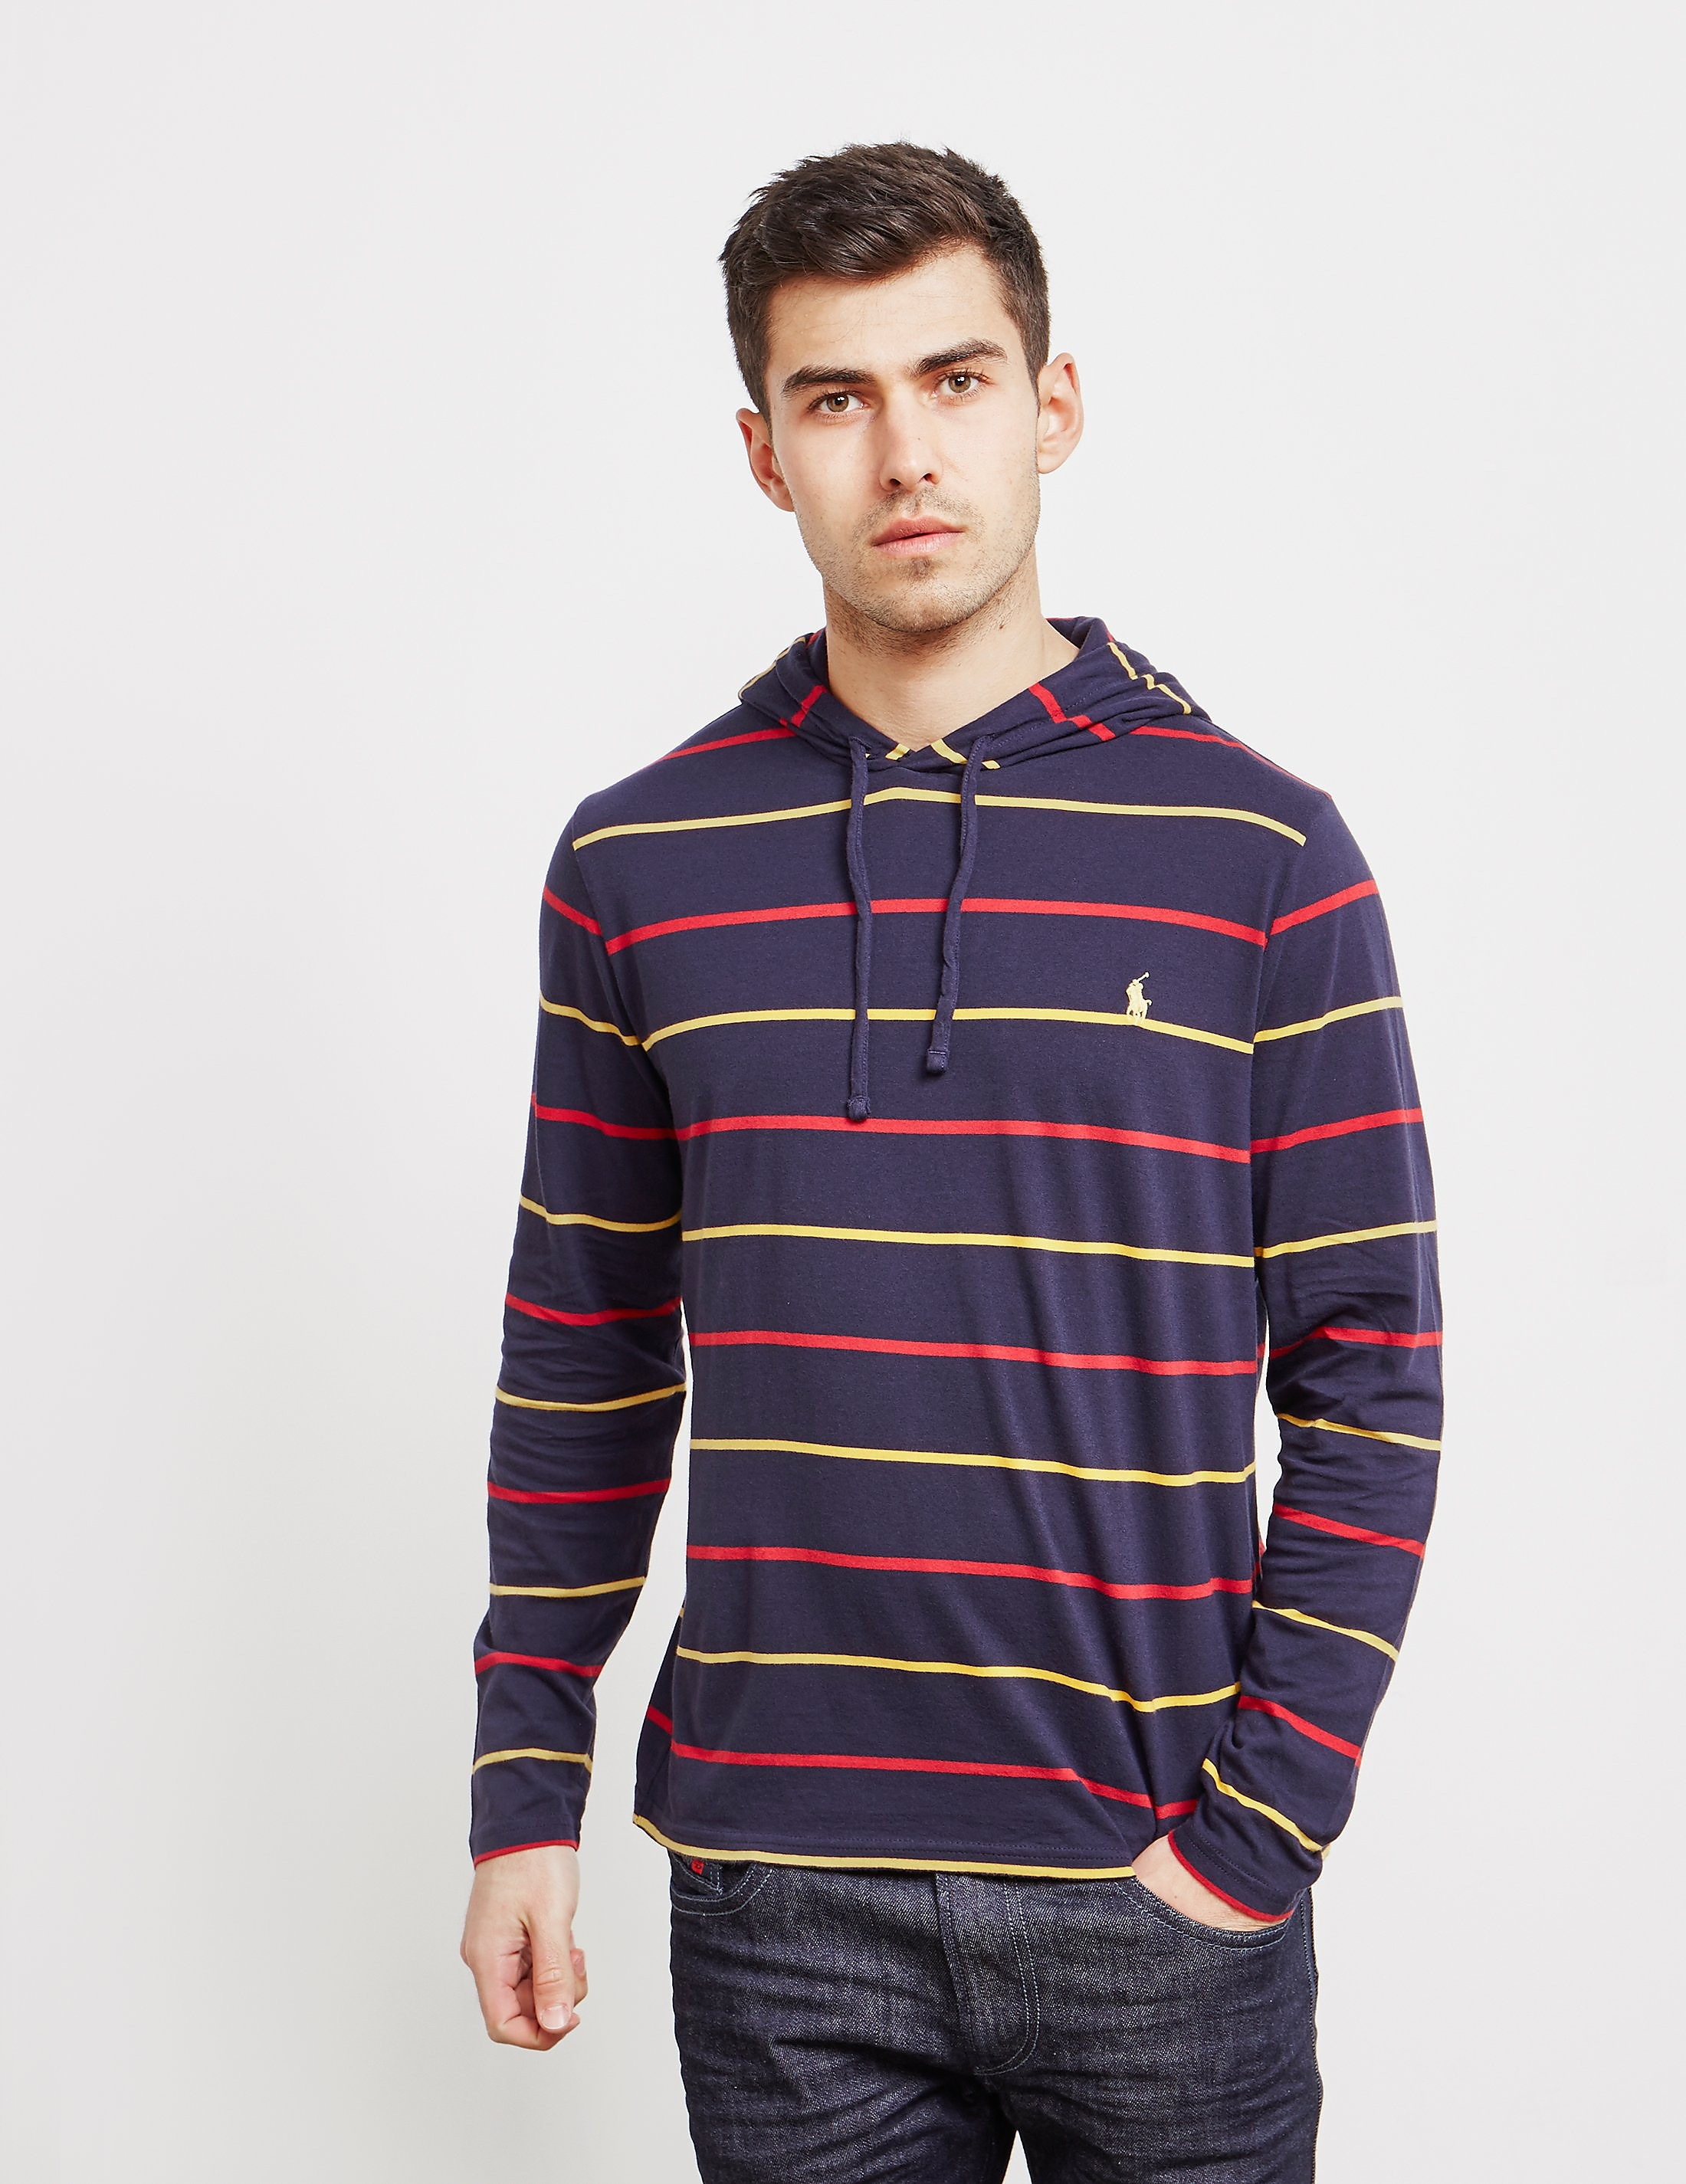 2c66f15f Mens Polo Ralph Lauren Stripe Hooded Long Sleeve T-Shirt Navy blue, Navy  blue